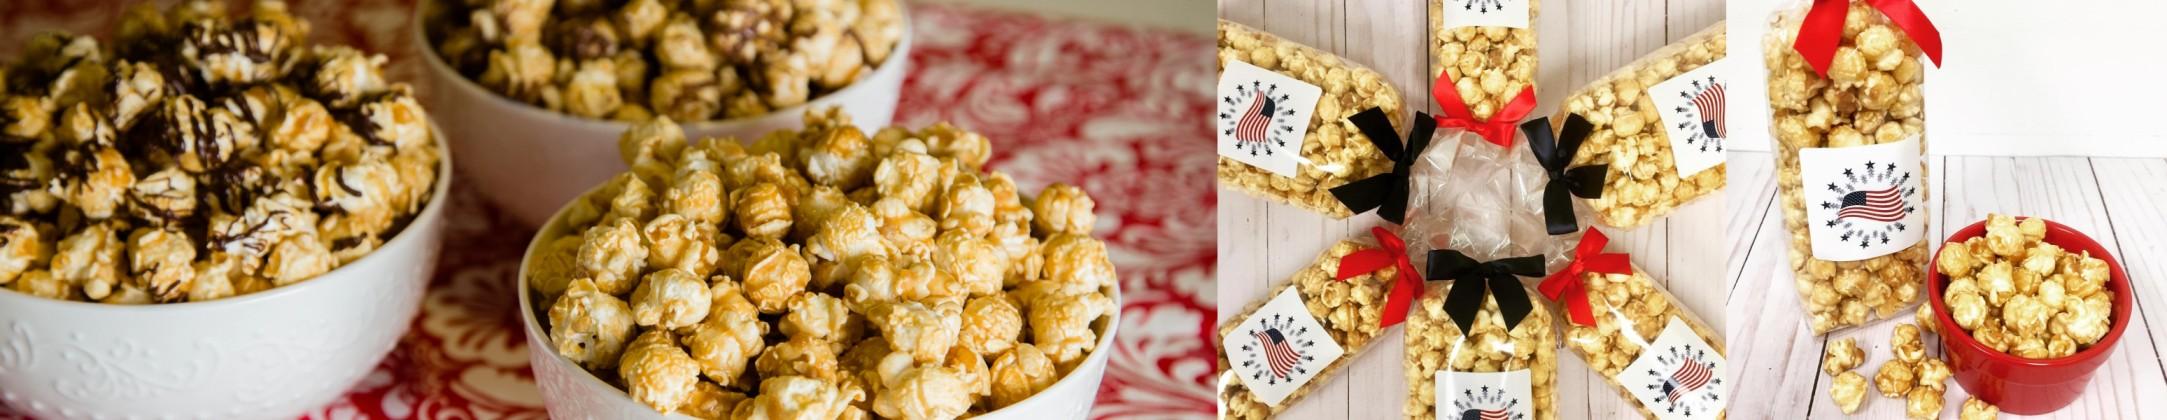 Popsations Popcorn